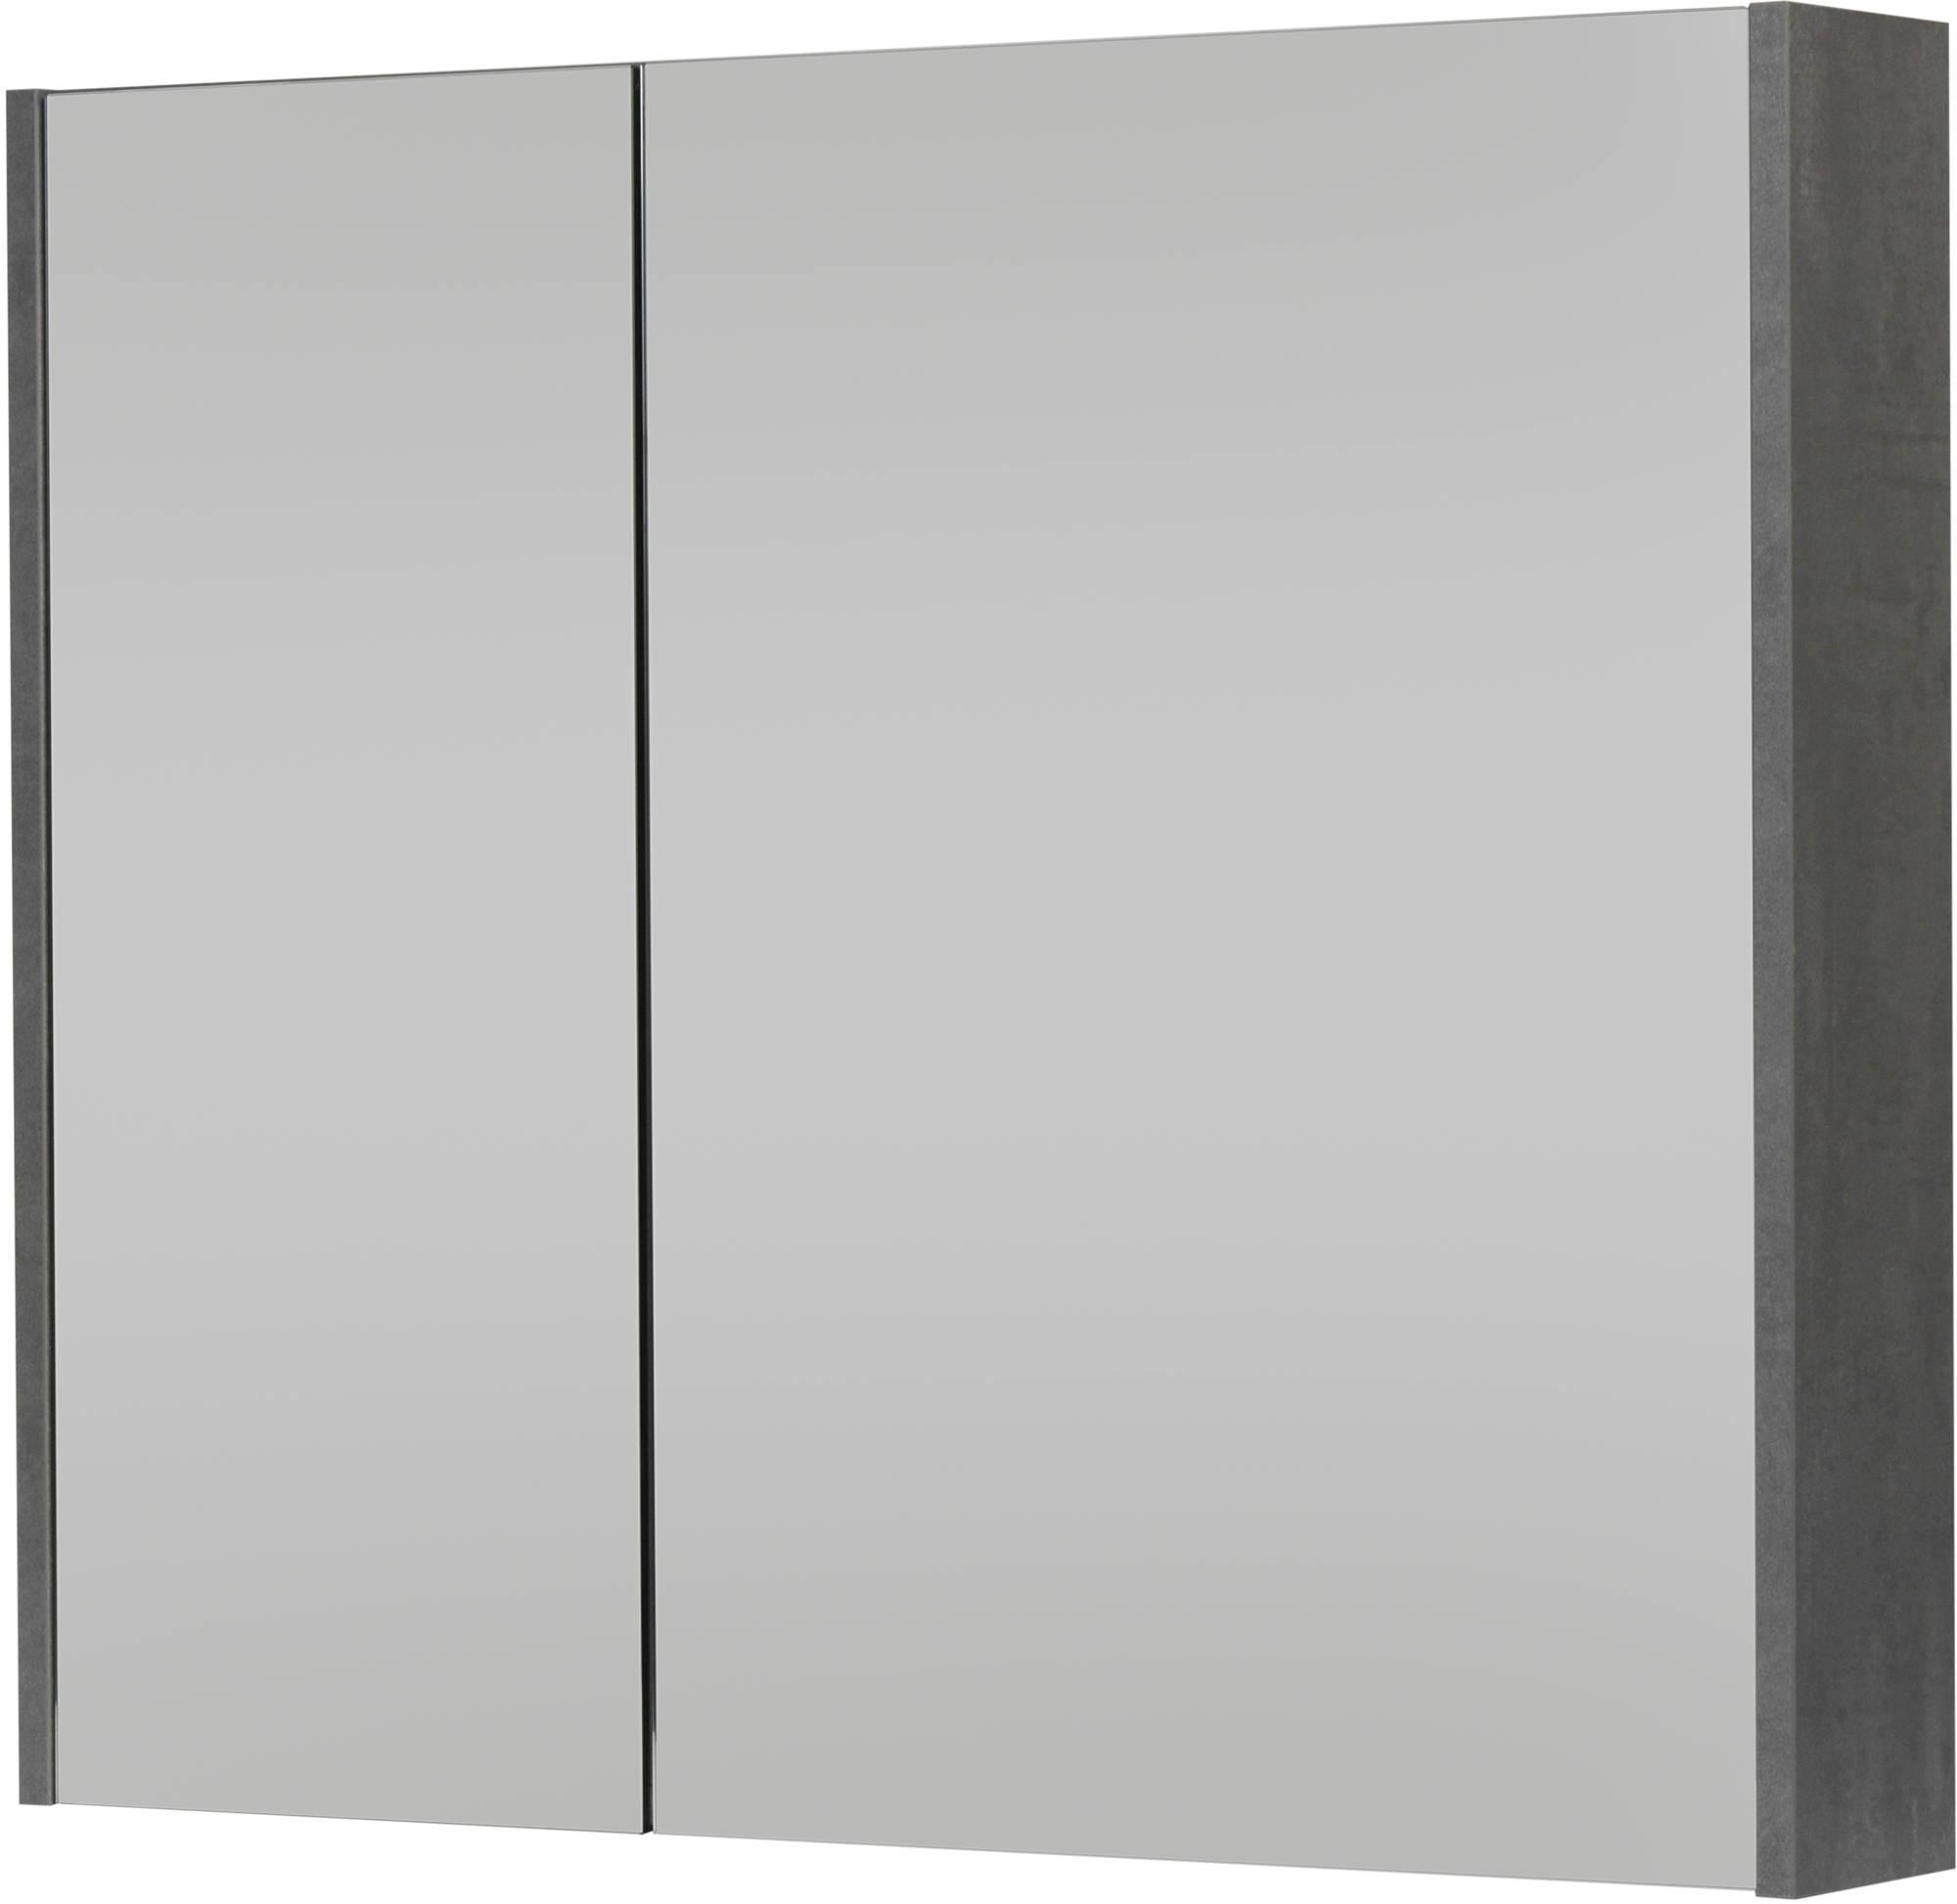 Saniselect Socan Spiegelkast 80x14x70 cm Beton Grijs